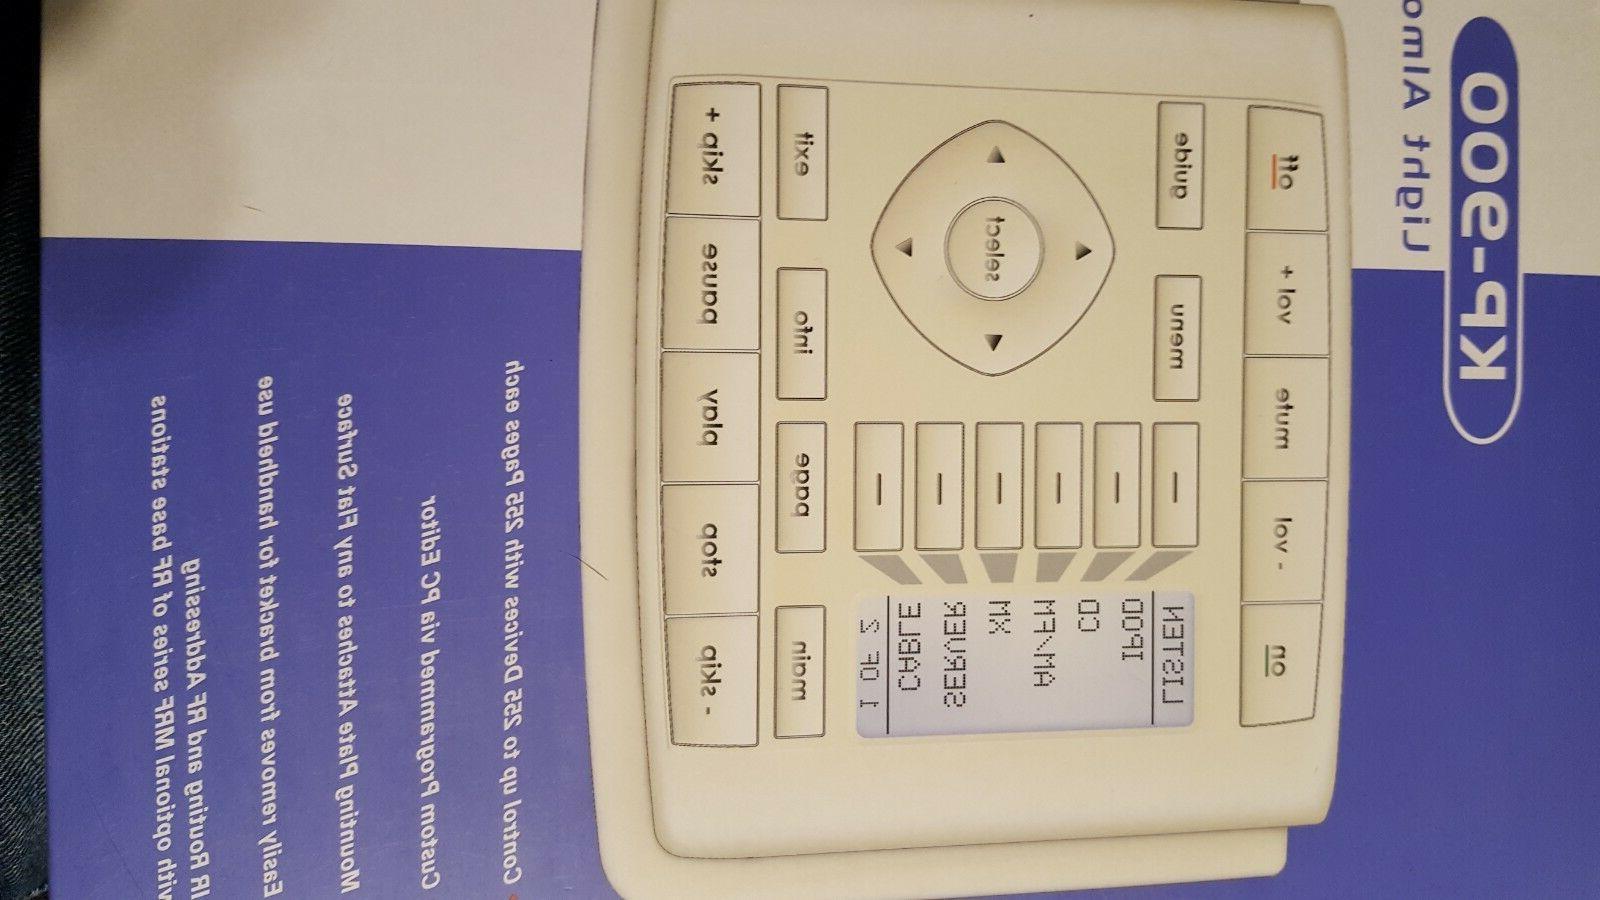 new universal remote control kp 900 wireless